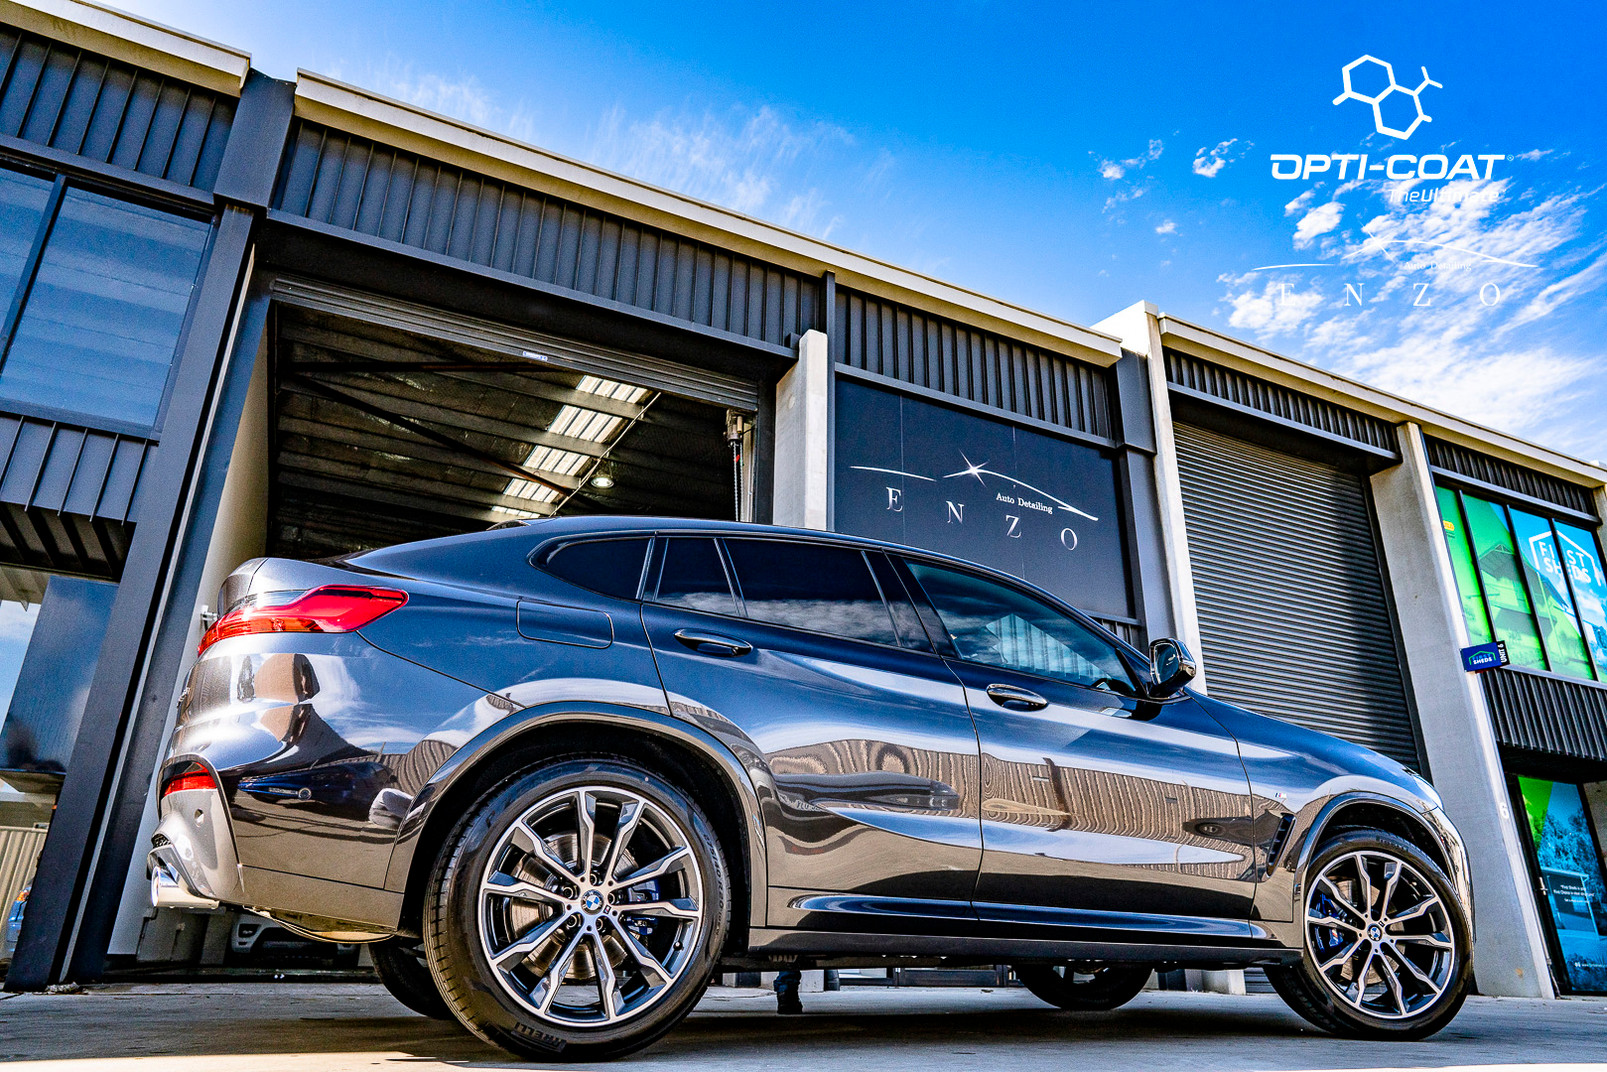 2019 BMW x4 20d M sportspack